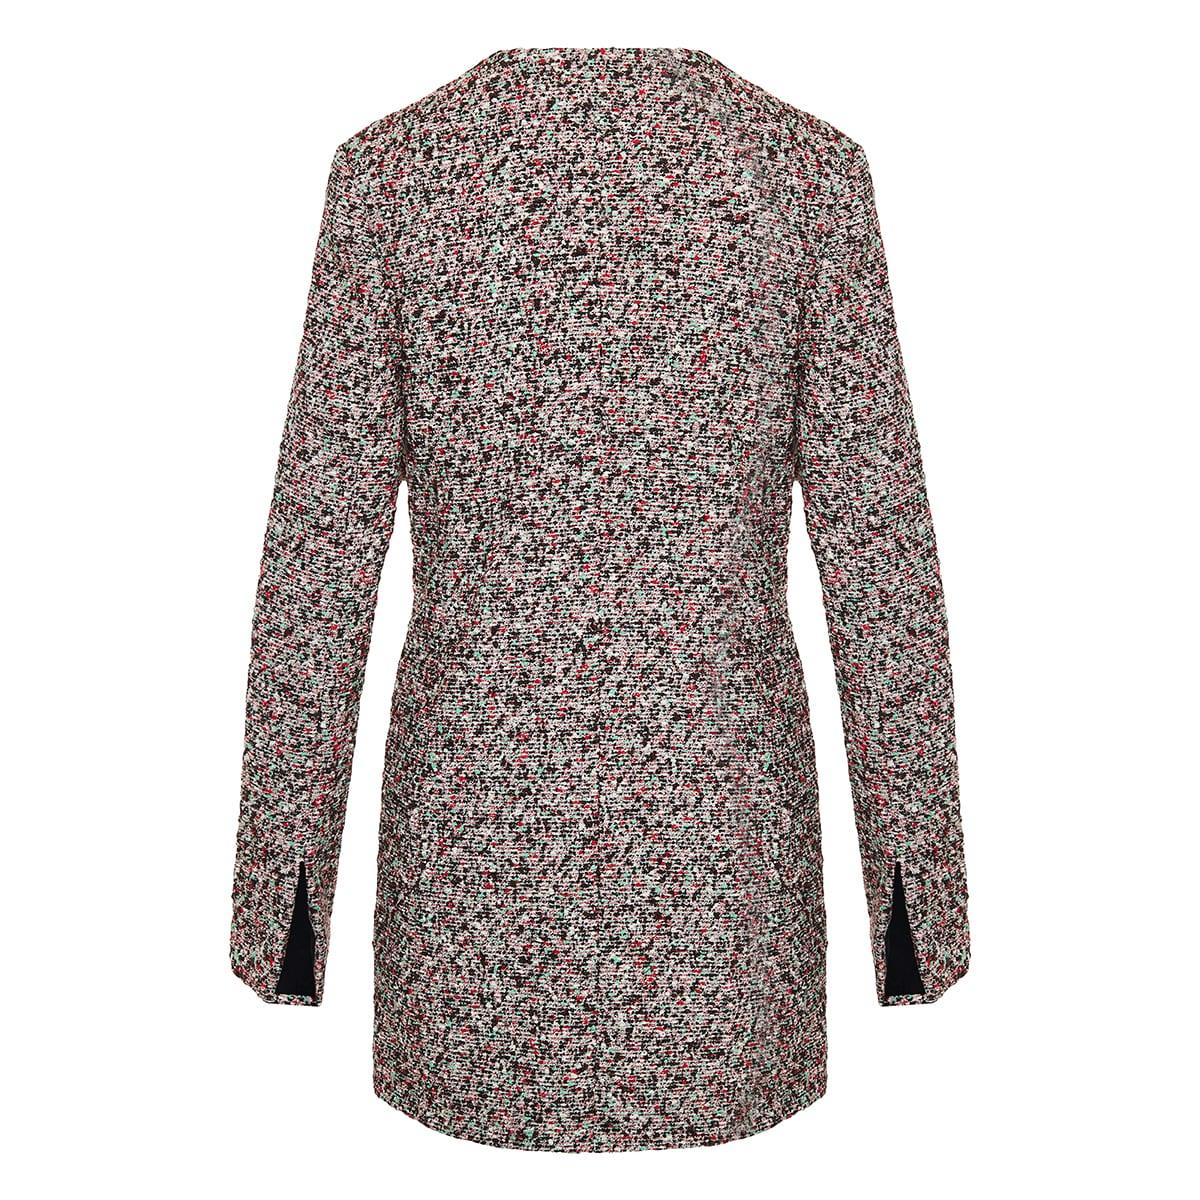 Tweed bouclé jacket